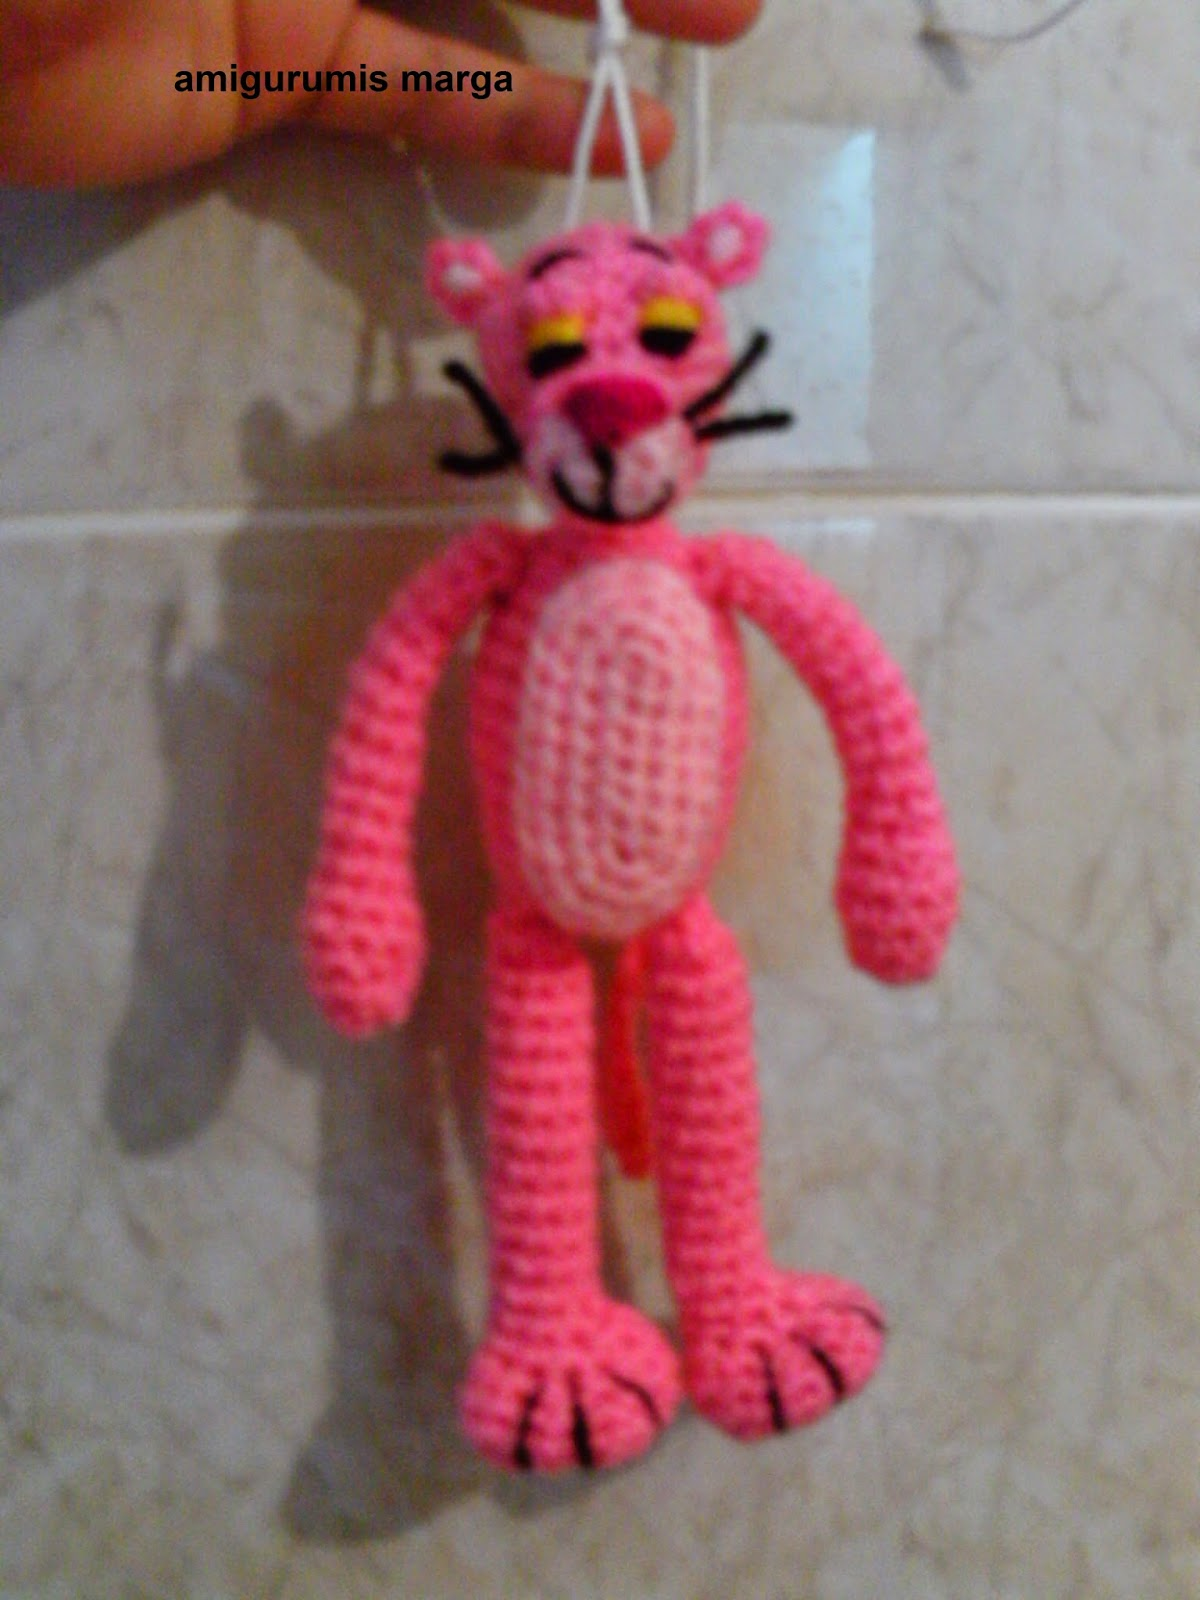 amigurumis marga: amigurumi pantera rosa mini